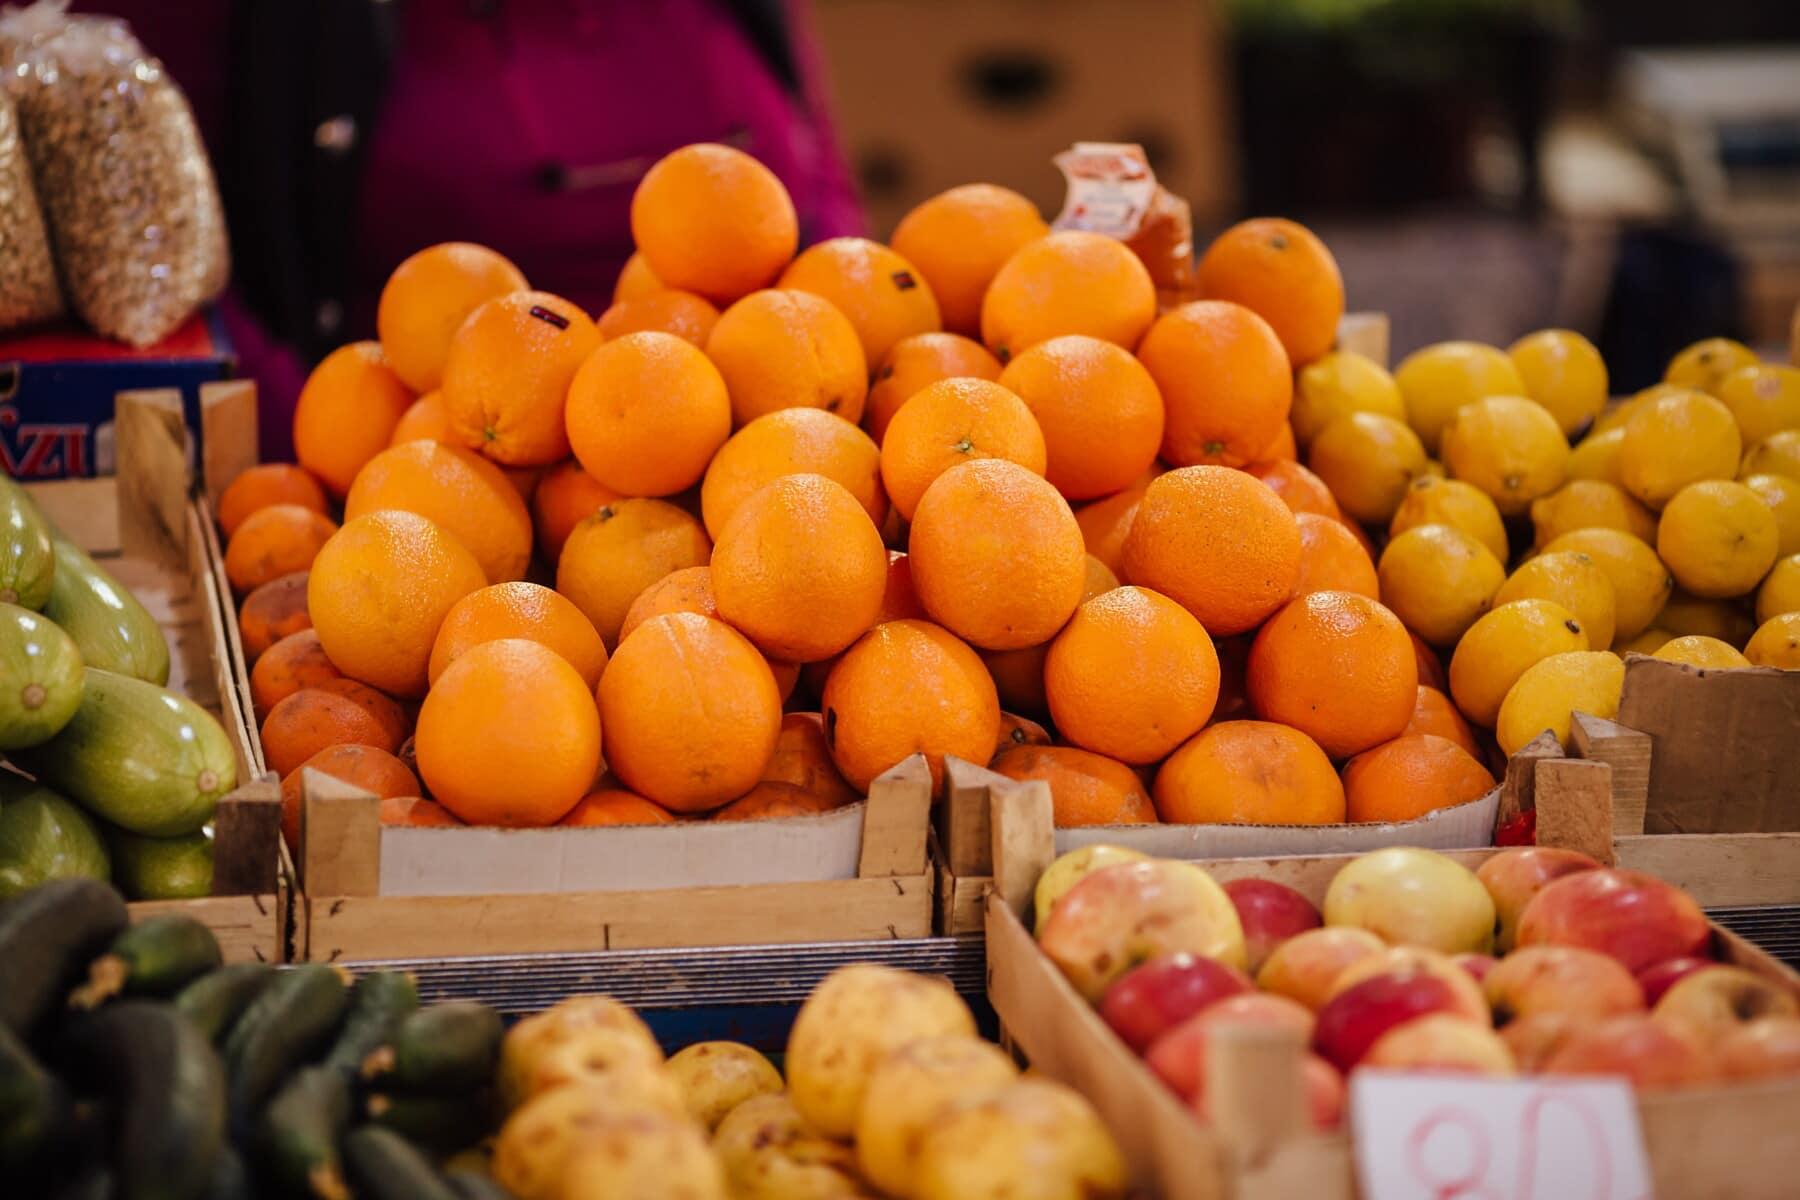 Marktplatz, Orangen, Äpfel, Gurke, Korb, Zitrone, Ware, Krämer, Produkte, Markt